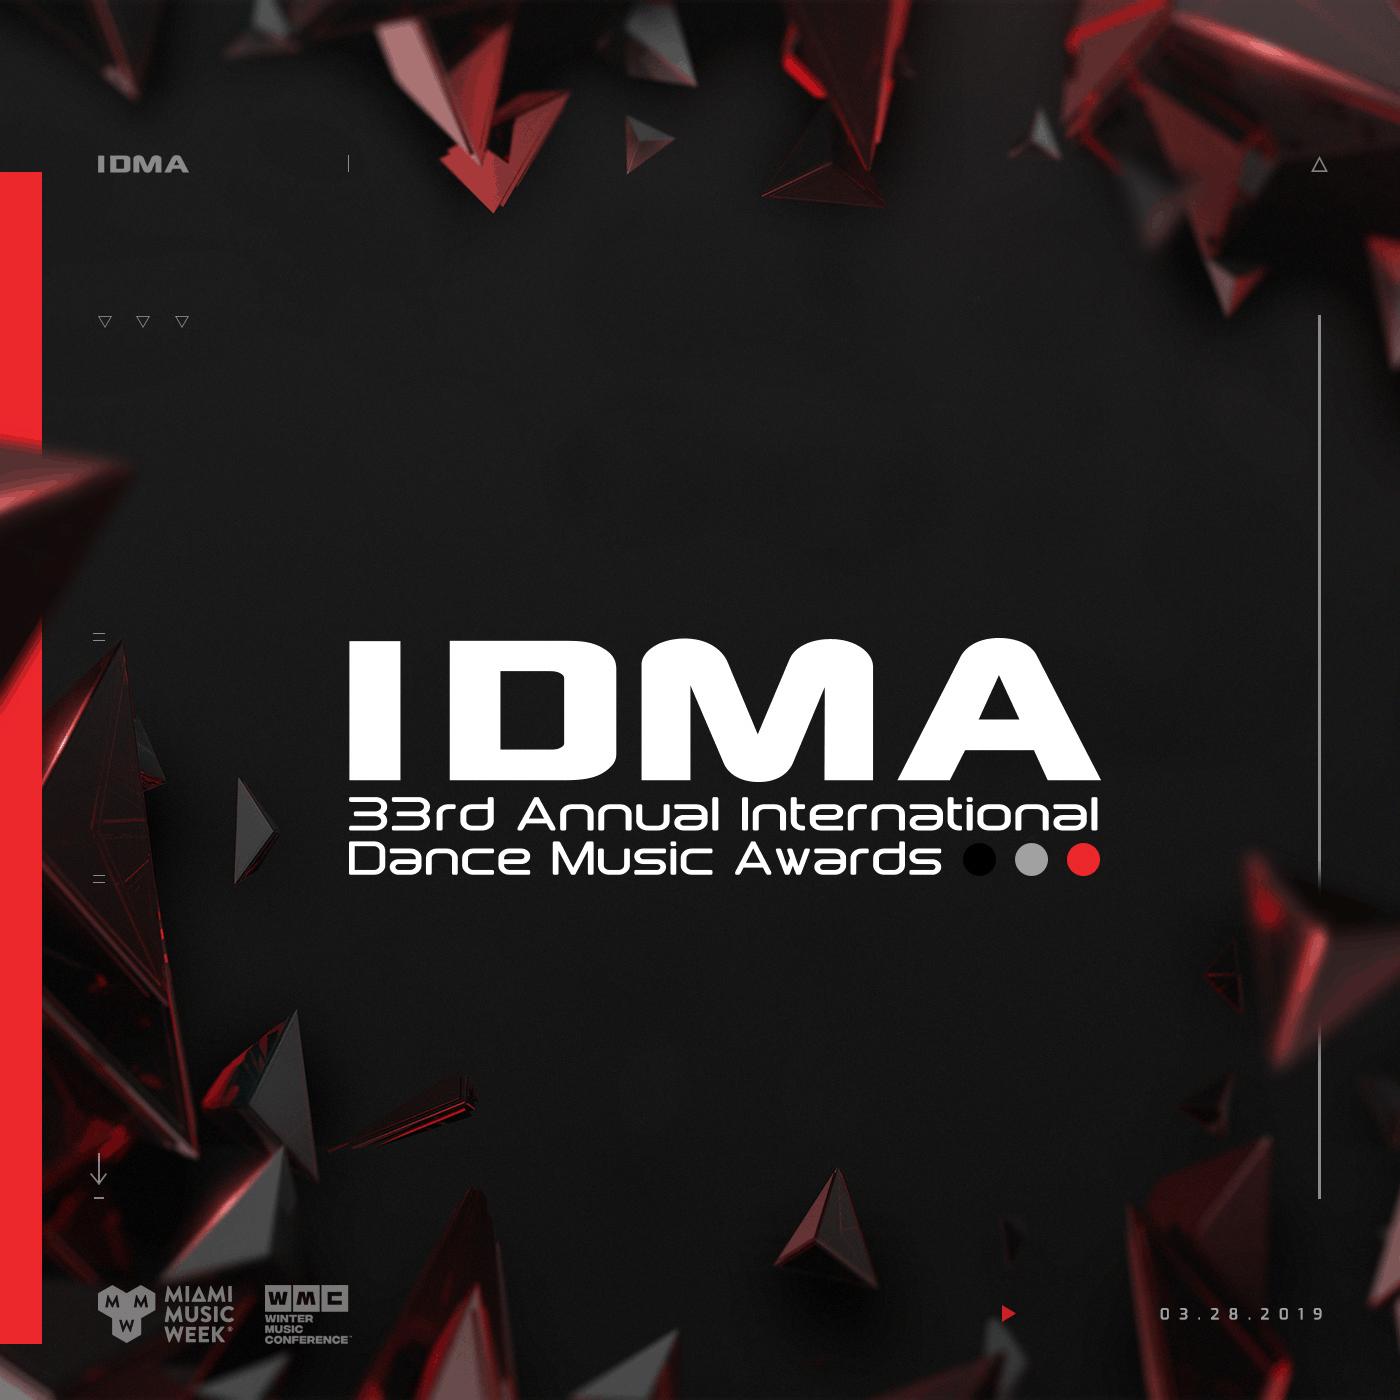 33rd annual International Dance Music Awards